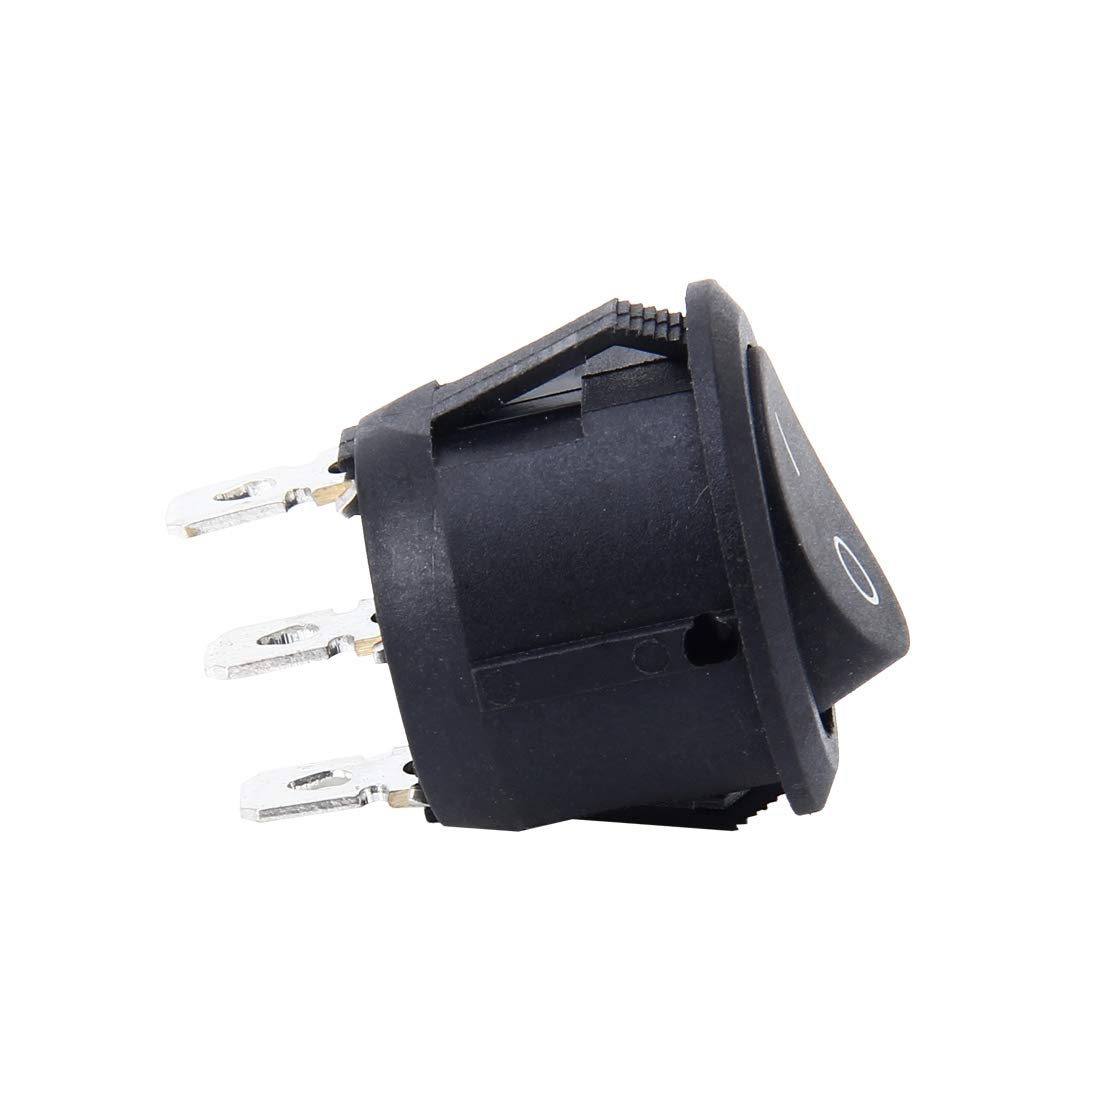 Voltury Interrupteur marche//arr/êt 2 broches 250 V 6 A 125 V 10 A 20 mm Rocker on off Noir